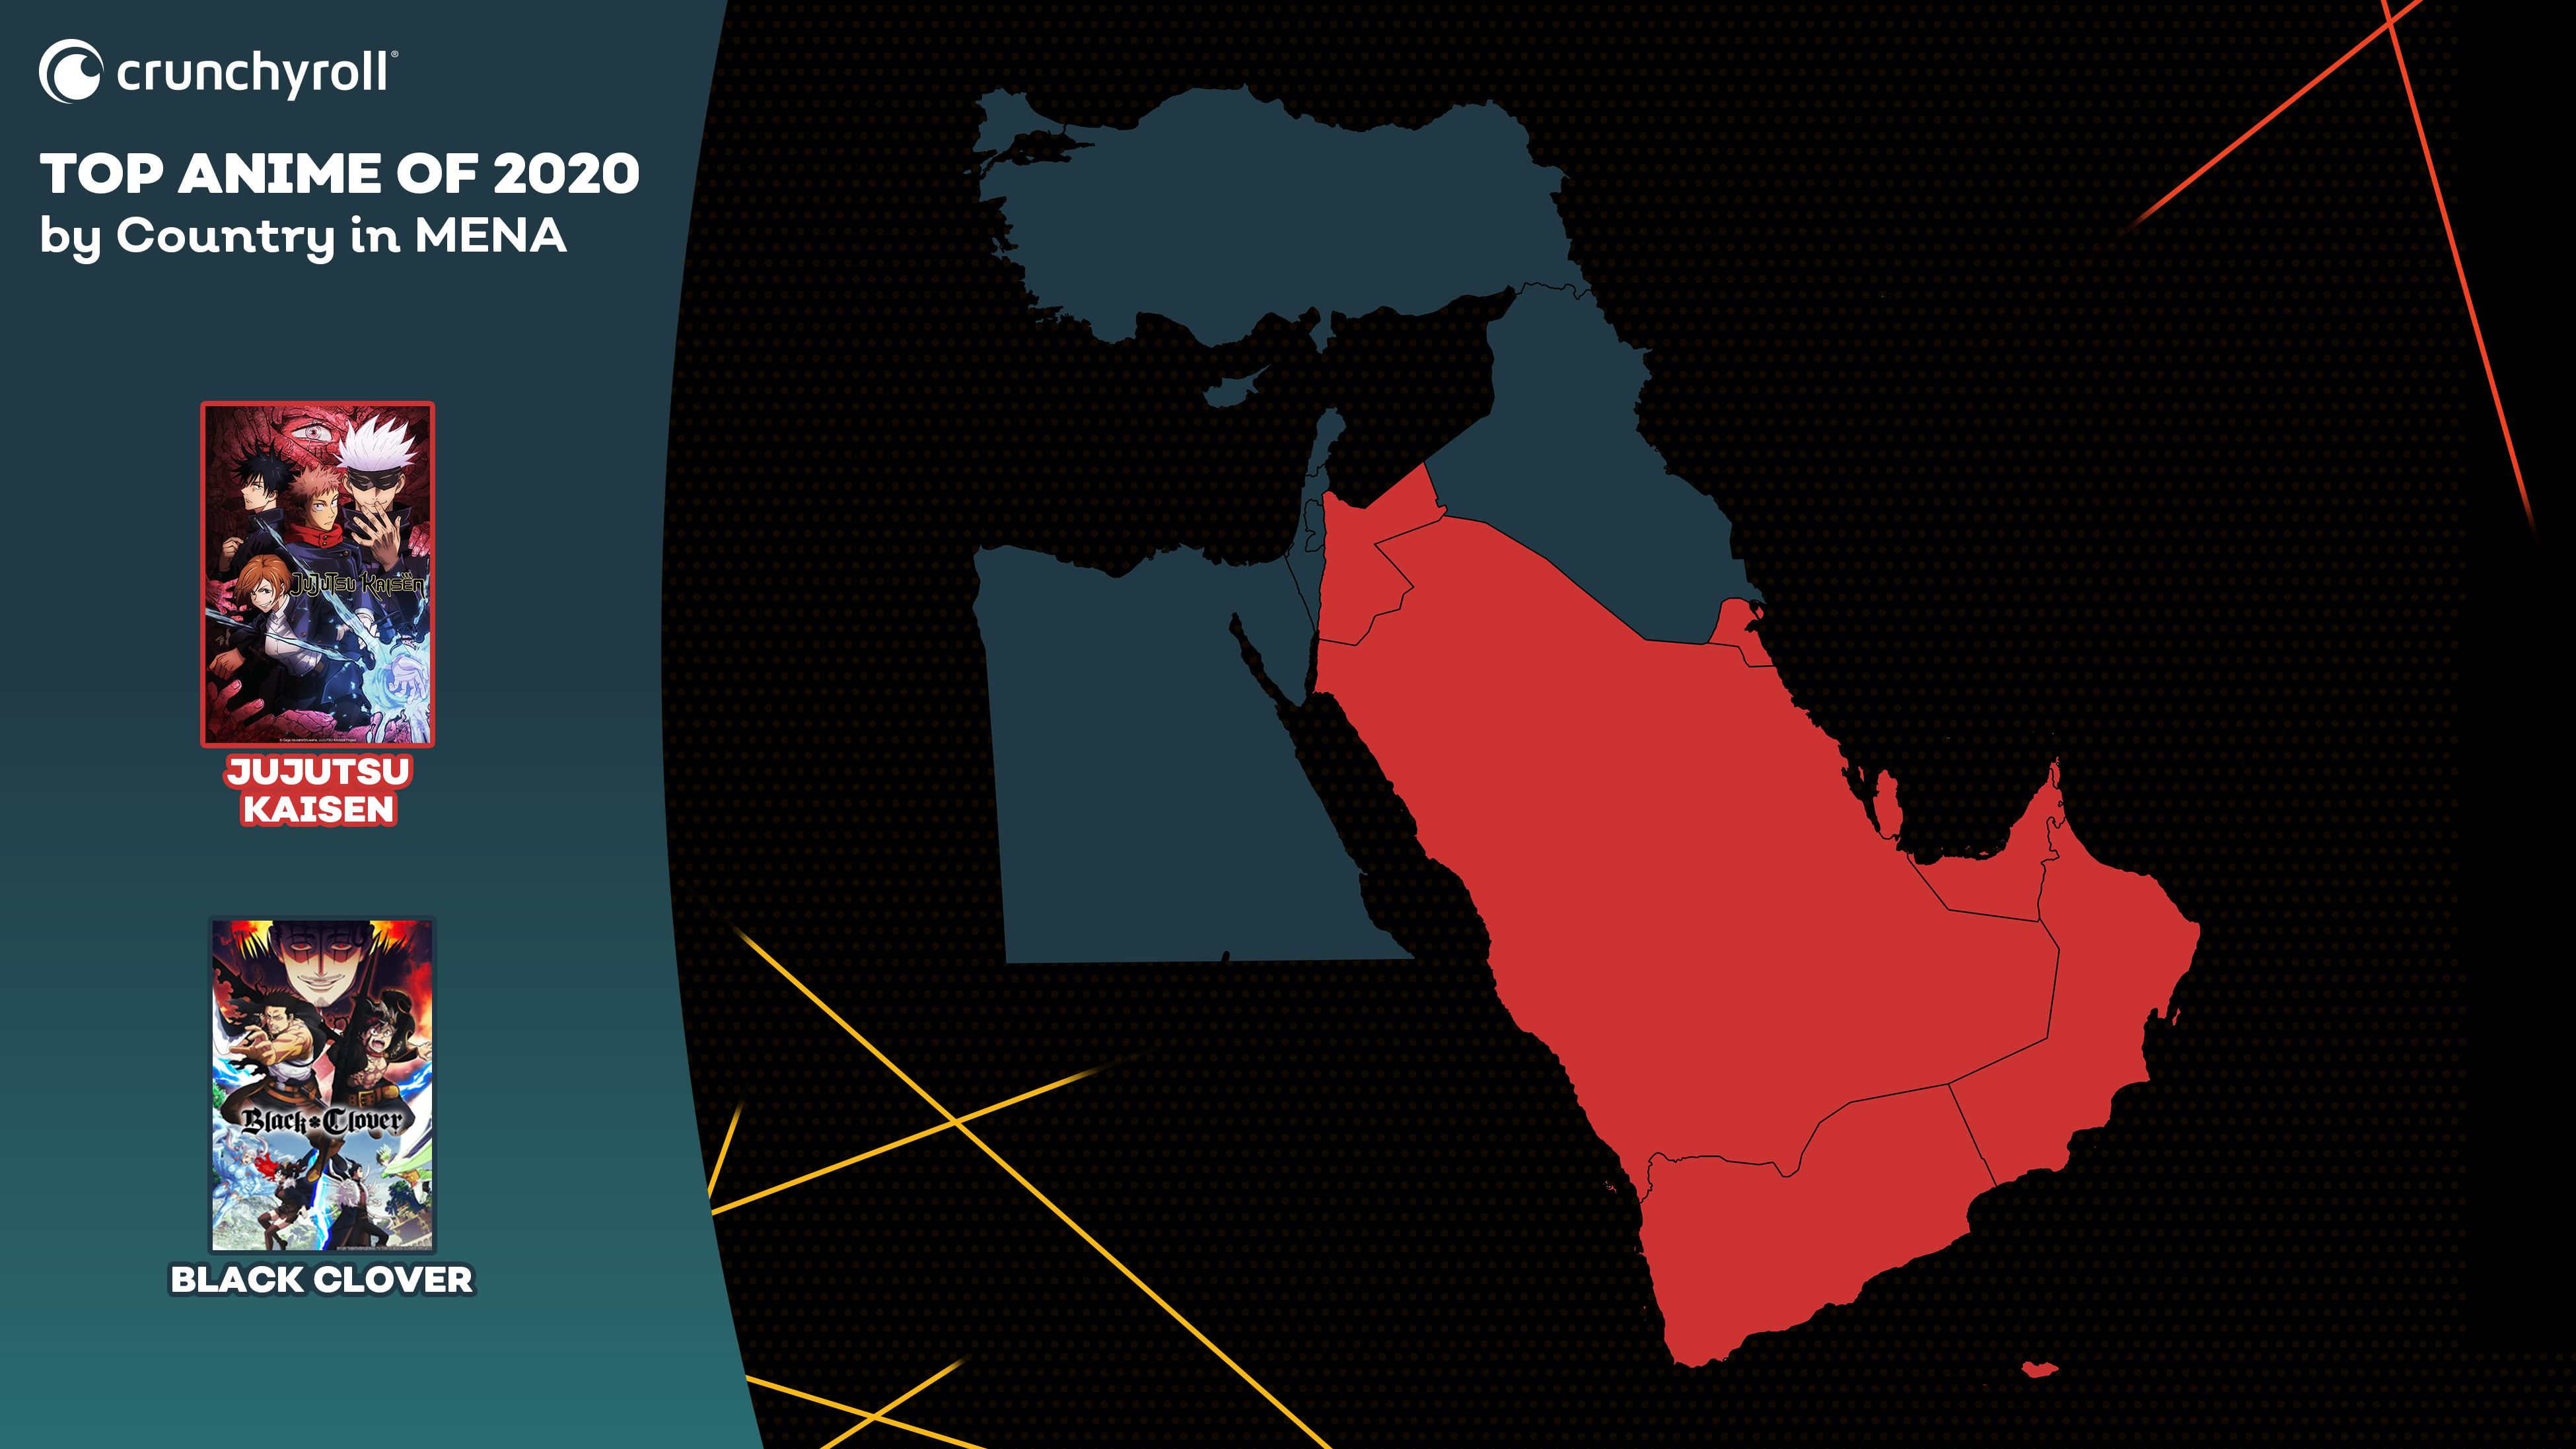 Mejor anime de 2020 por país - Medio Oriente